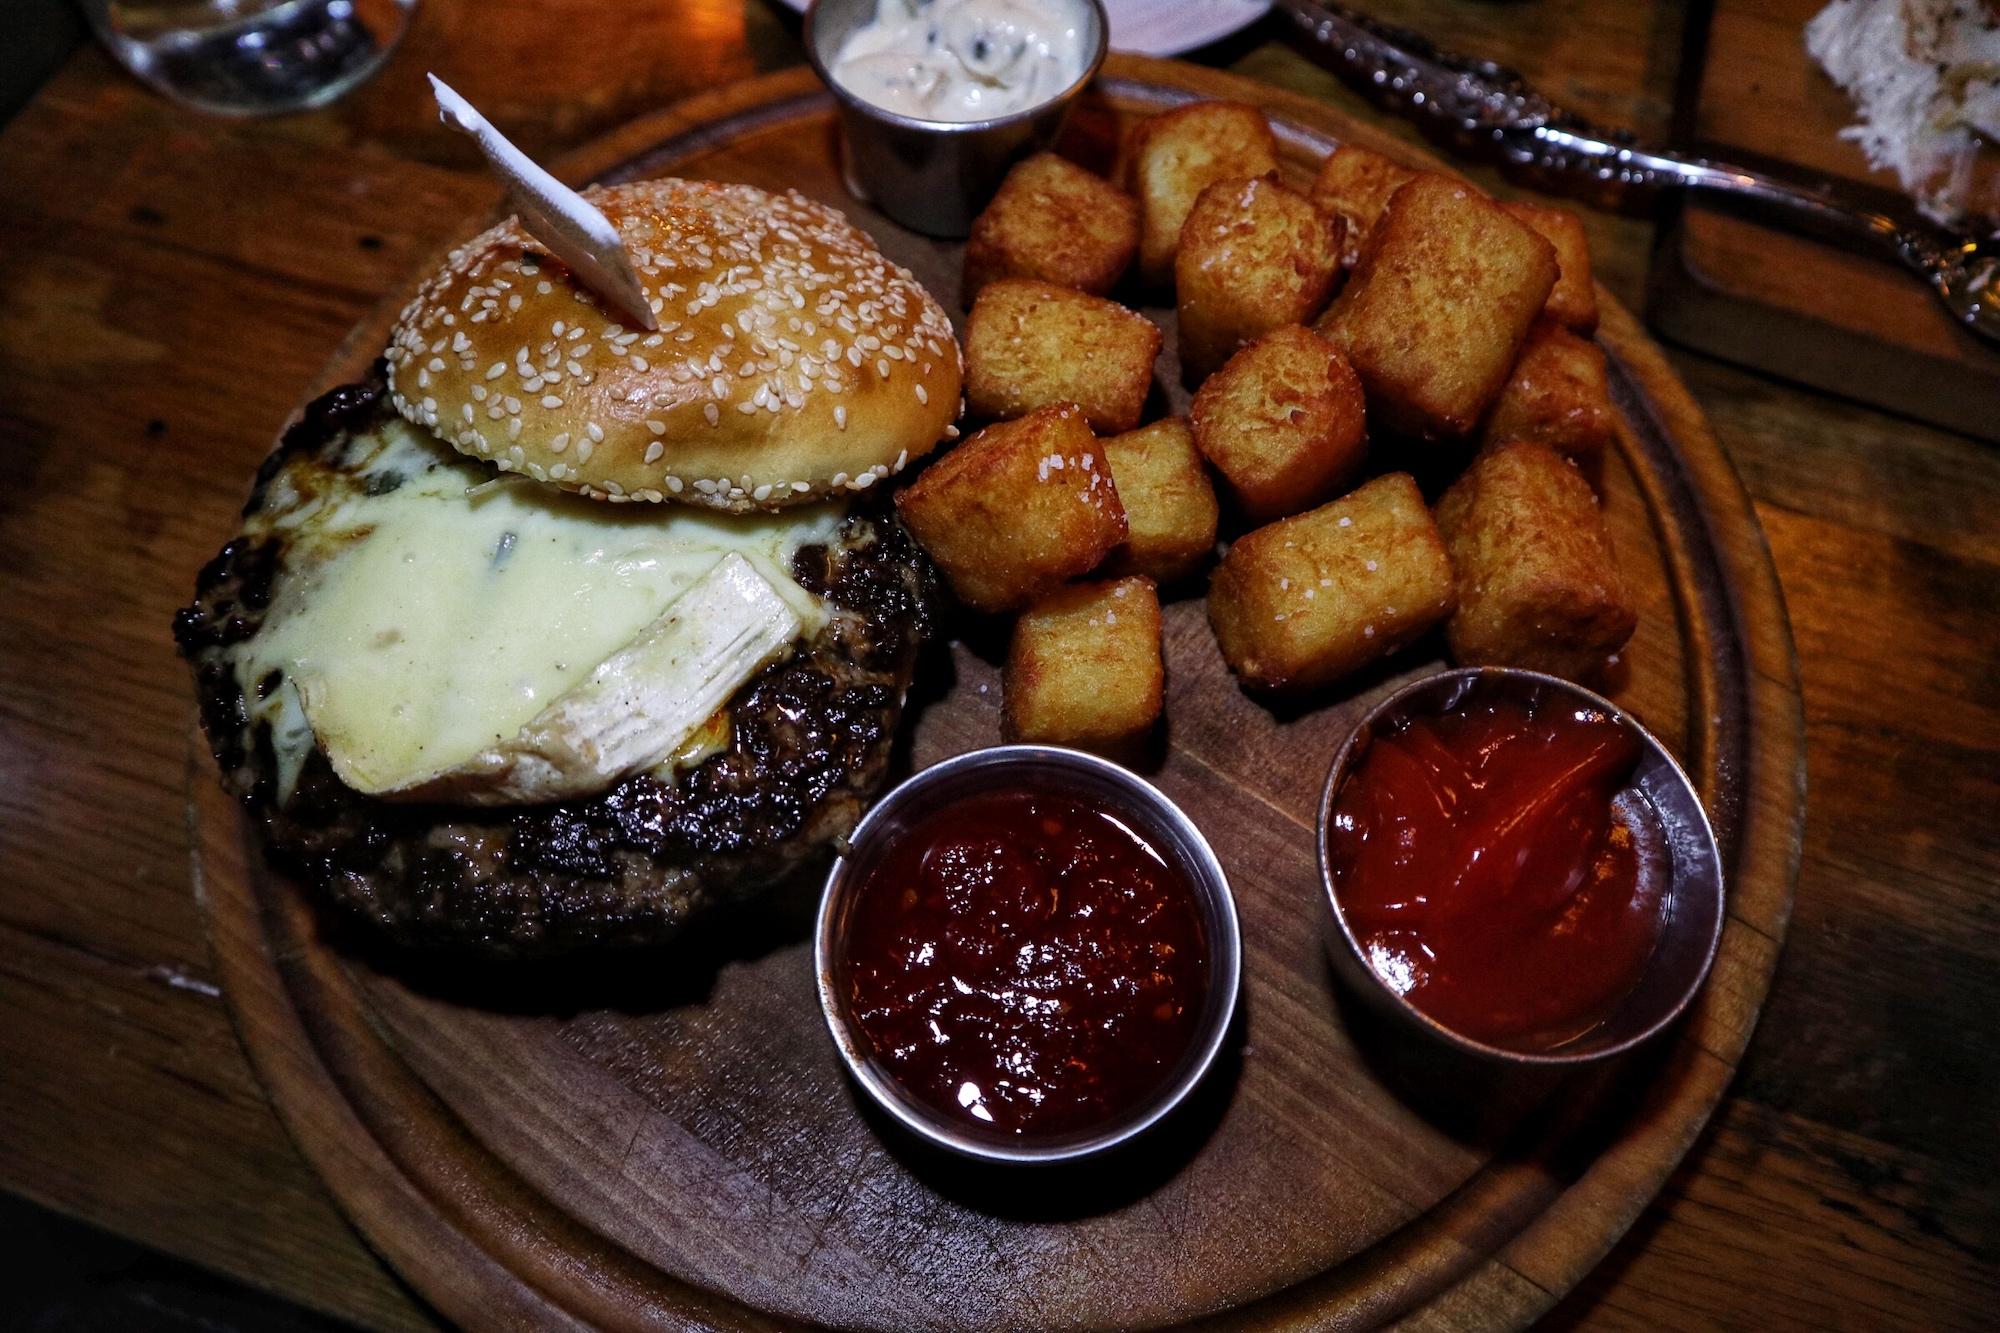 Pub Burger with Cambozola Cheese, Tomato Jam, sub TOTS!